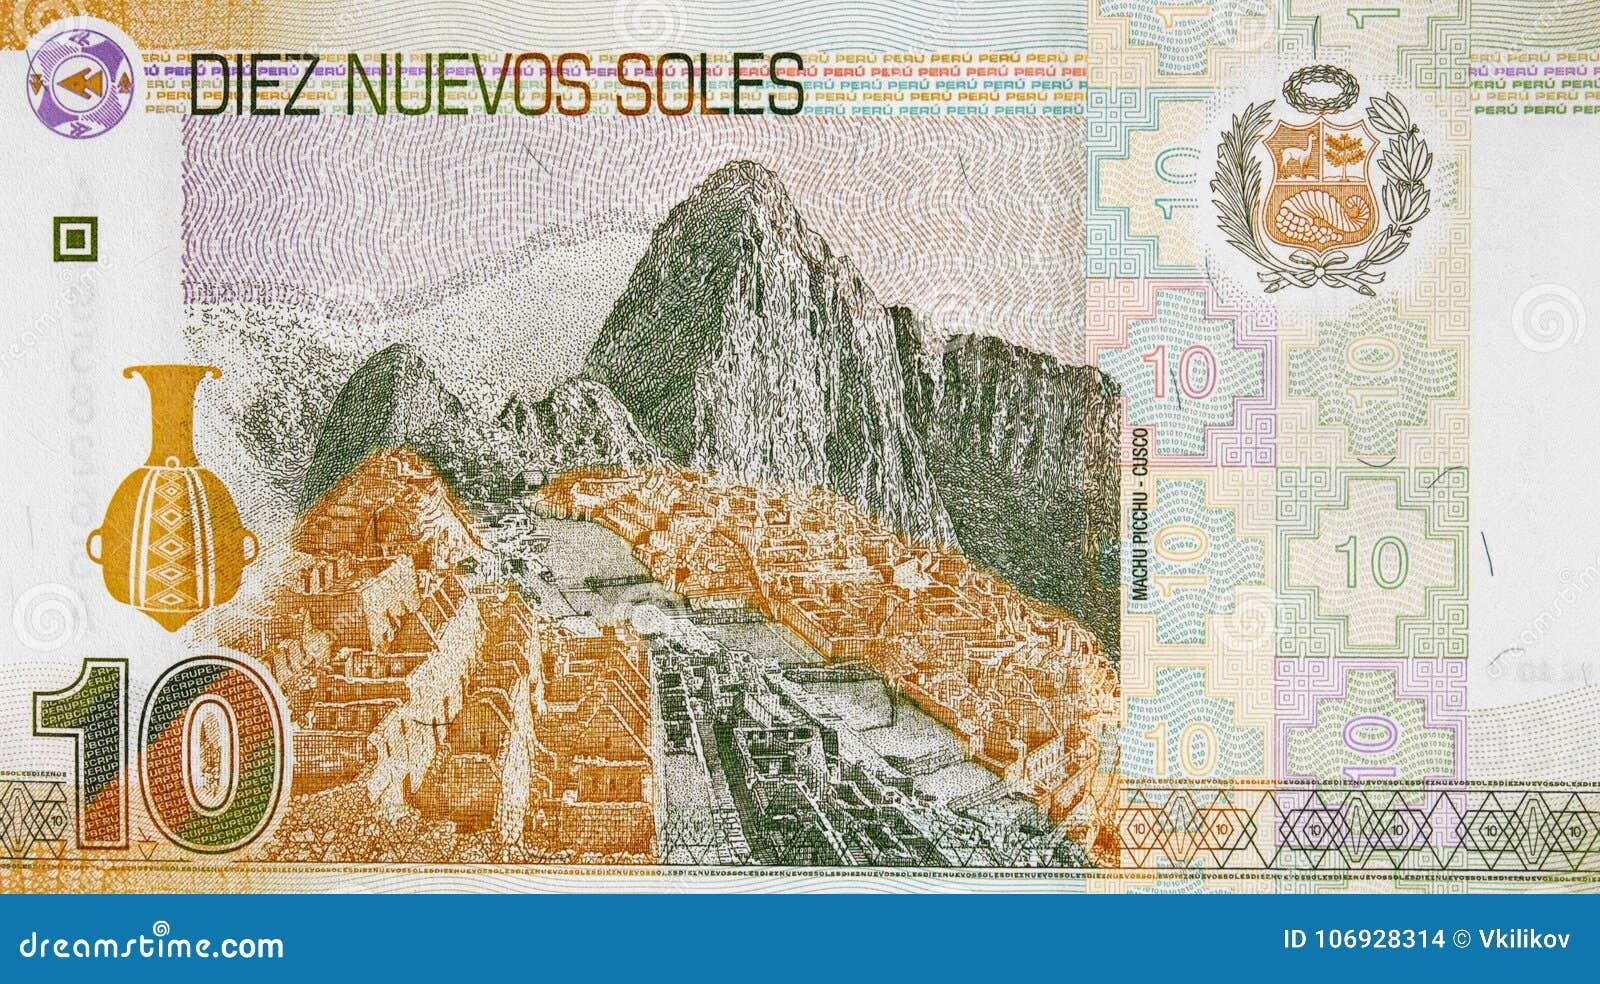 Machu picchu on peru currency 10 soles 2009 banknote peruvian stock download machu picchu on peru currency 10 soles 2009 banknote peruvian stock photo image altavistaventures Images